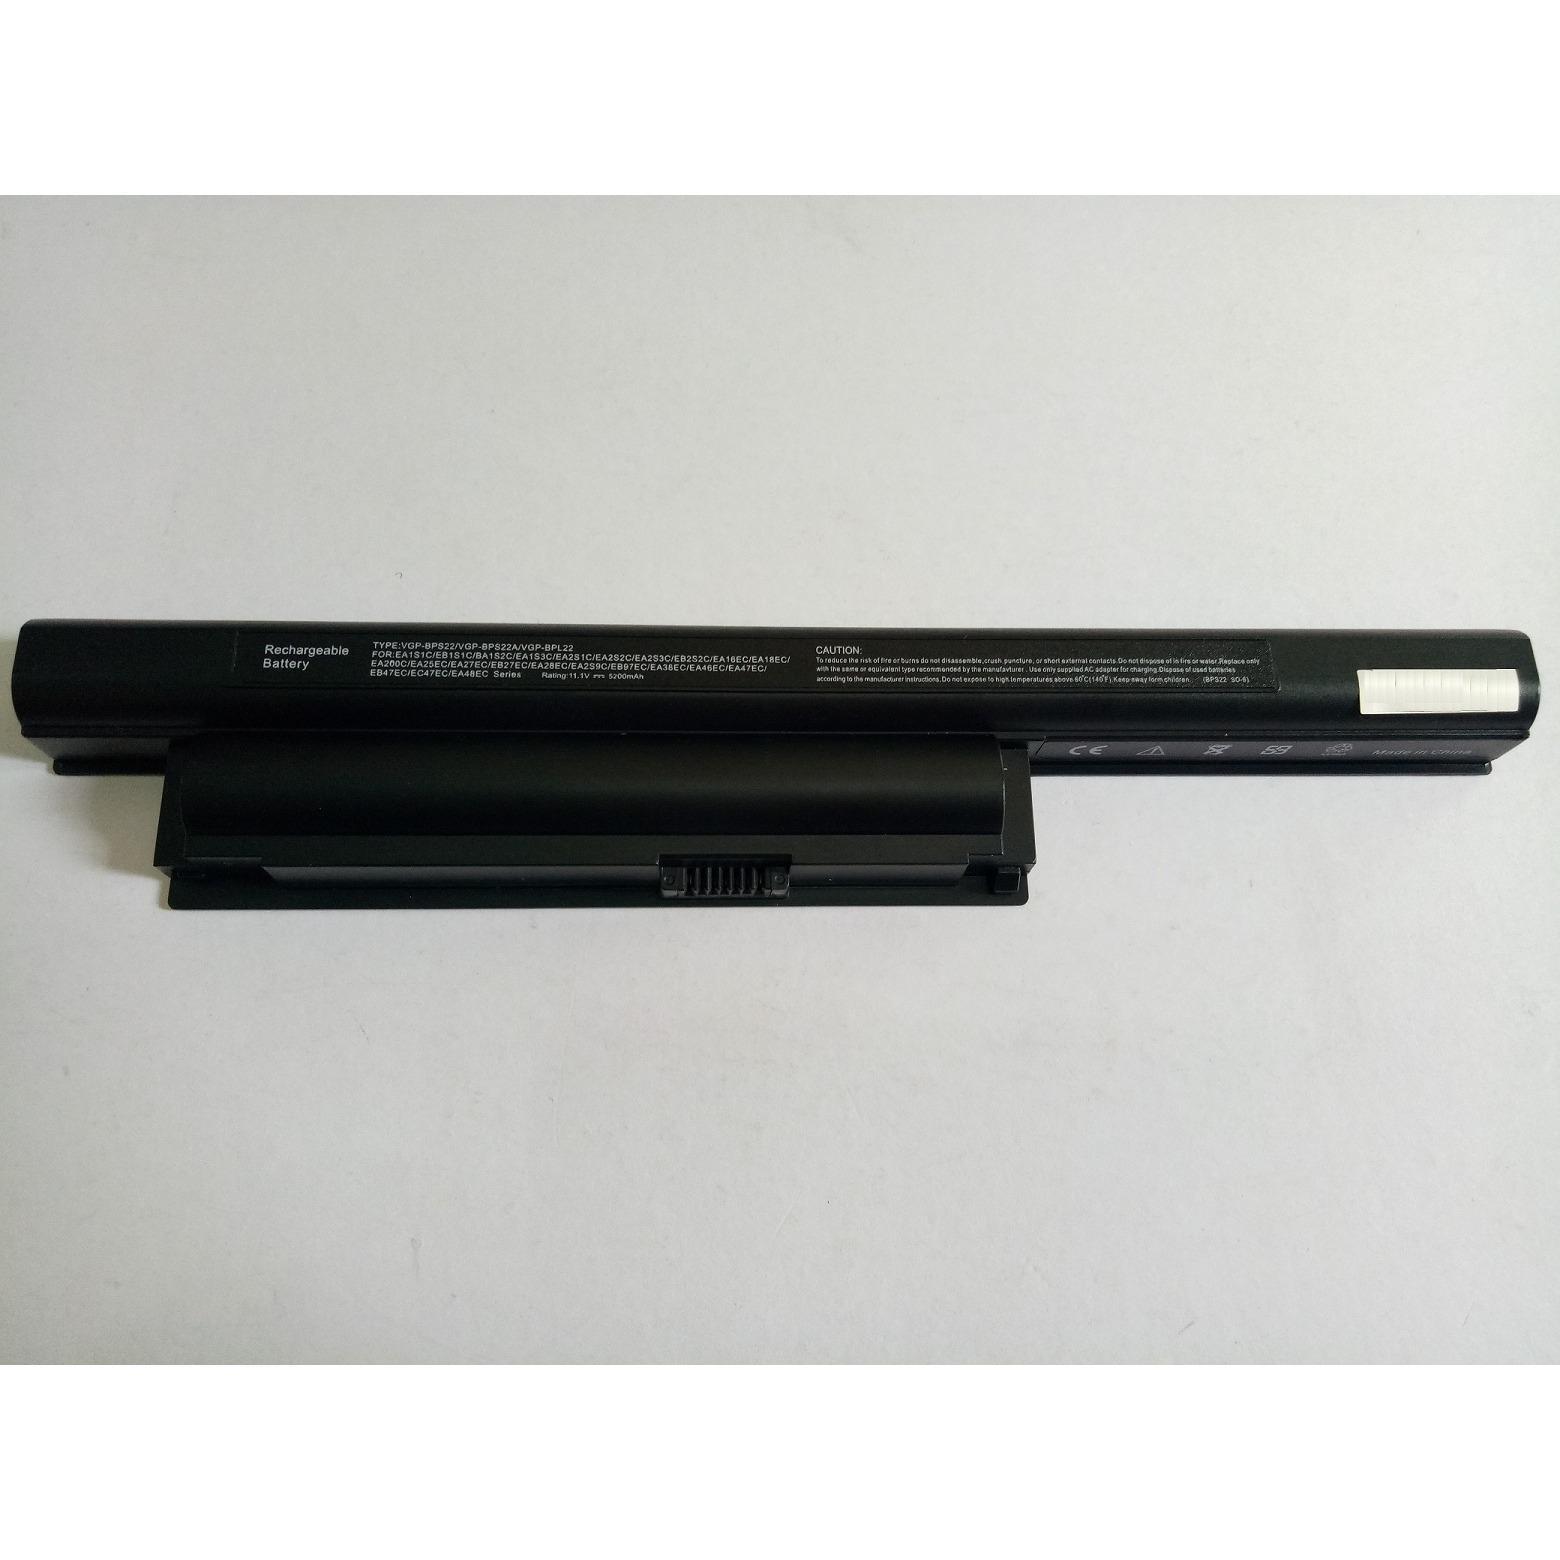 Sony Vaio VPCEG32FX/P Battery Checker 64Bit